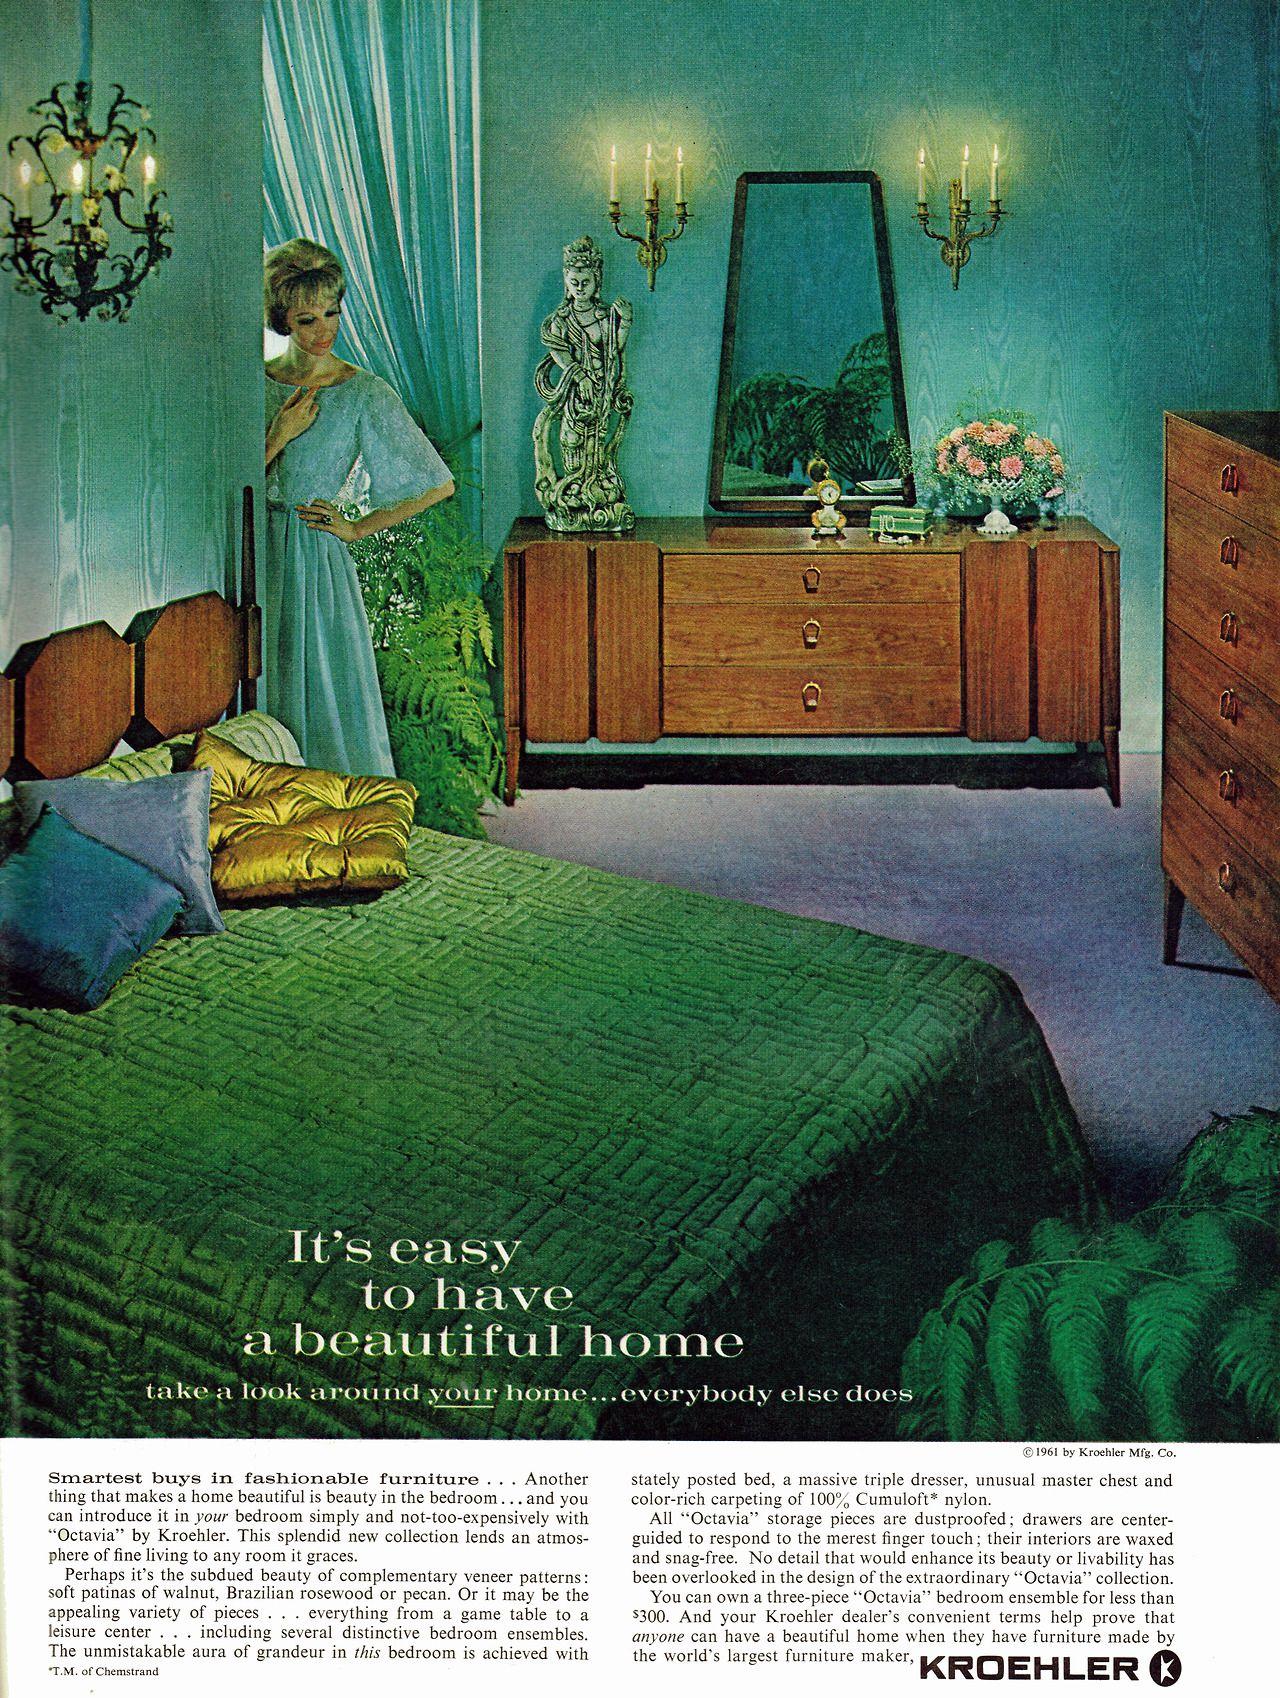 Kroehler Bedroom Furniture 1961 Bedroom Vintage Vintage